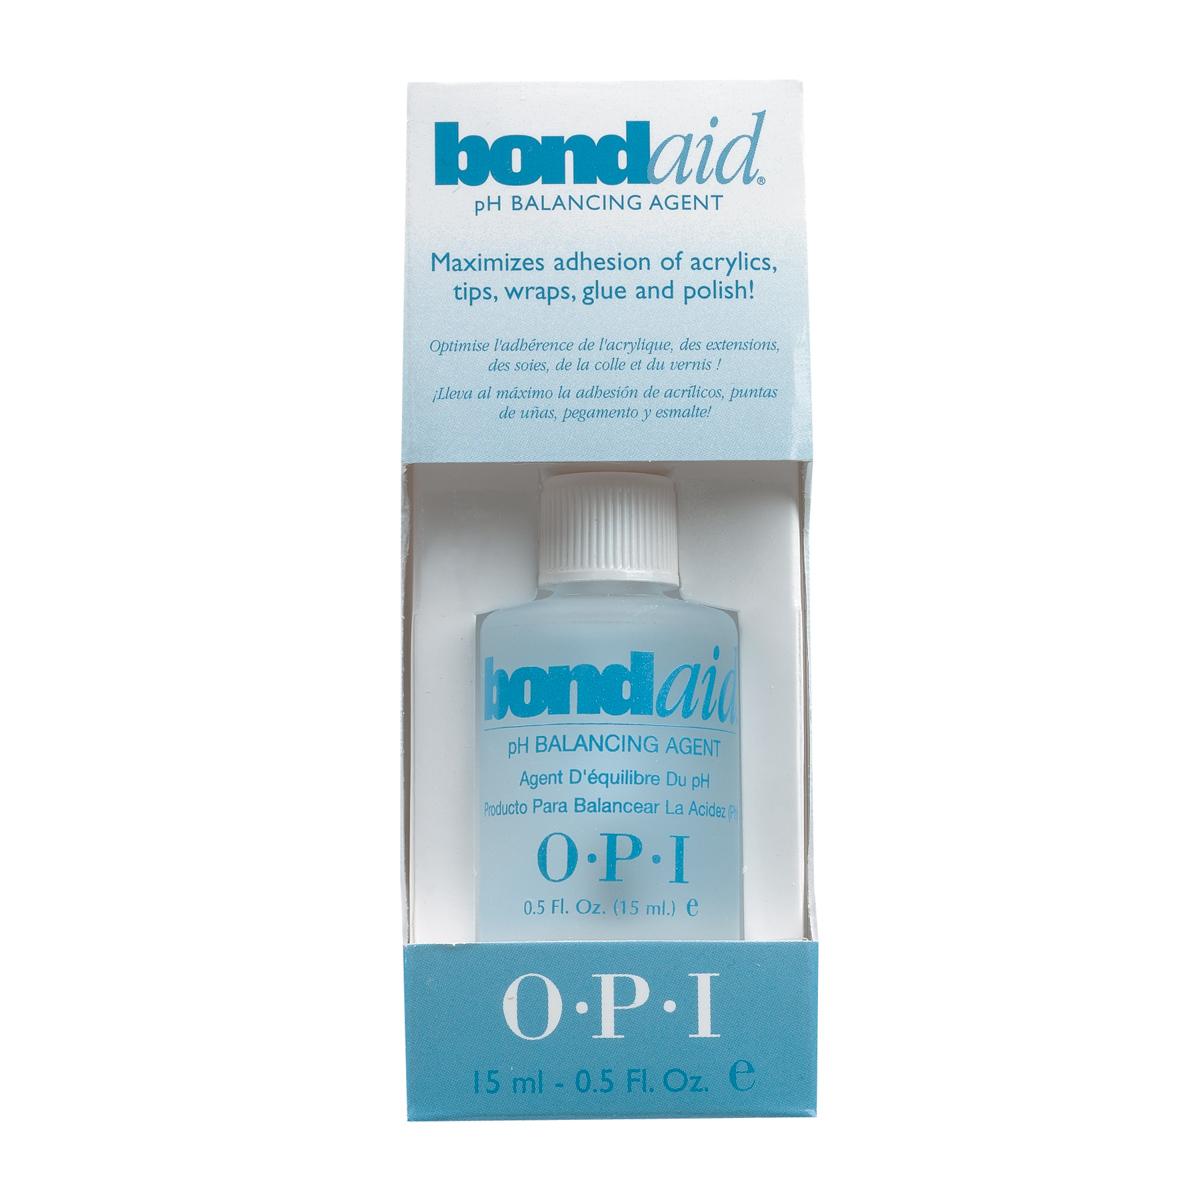 OPI Грунтовка-восстановитель ph баланса ногтя / Bond-Aid 15мл